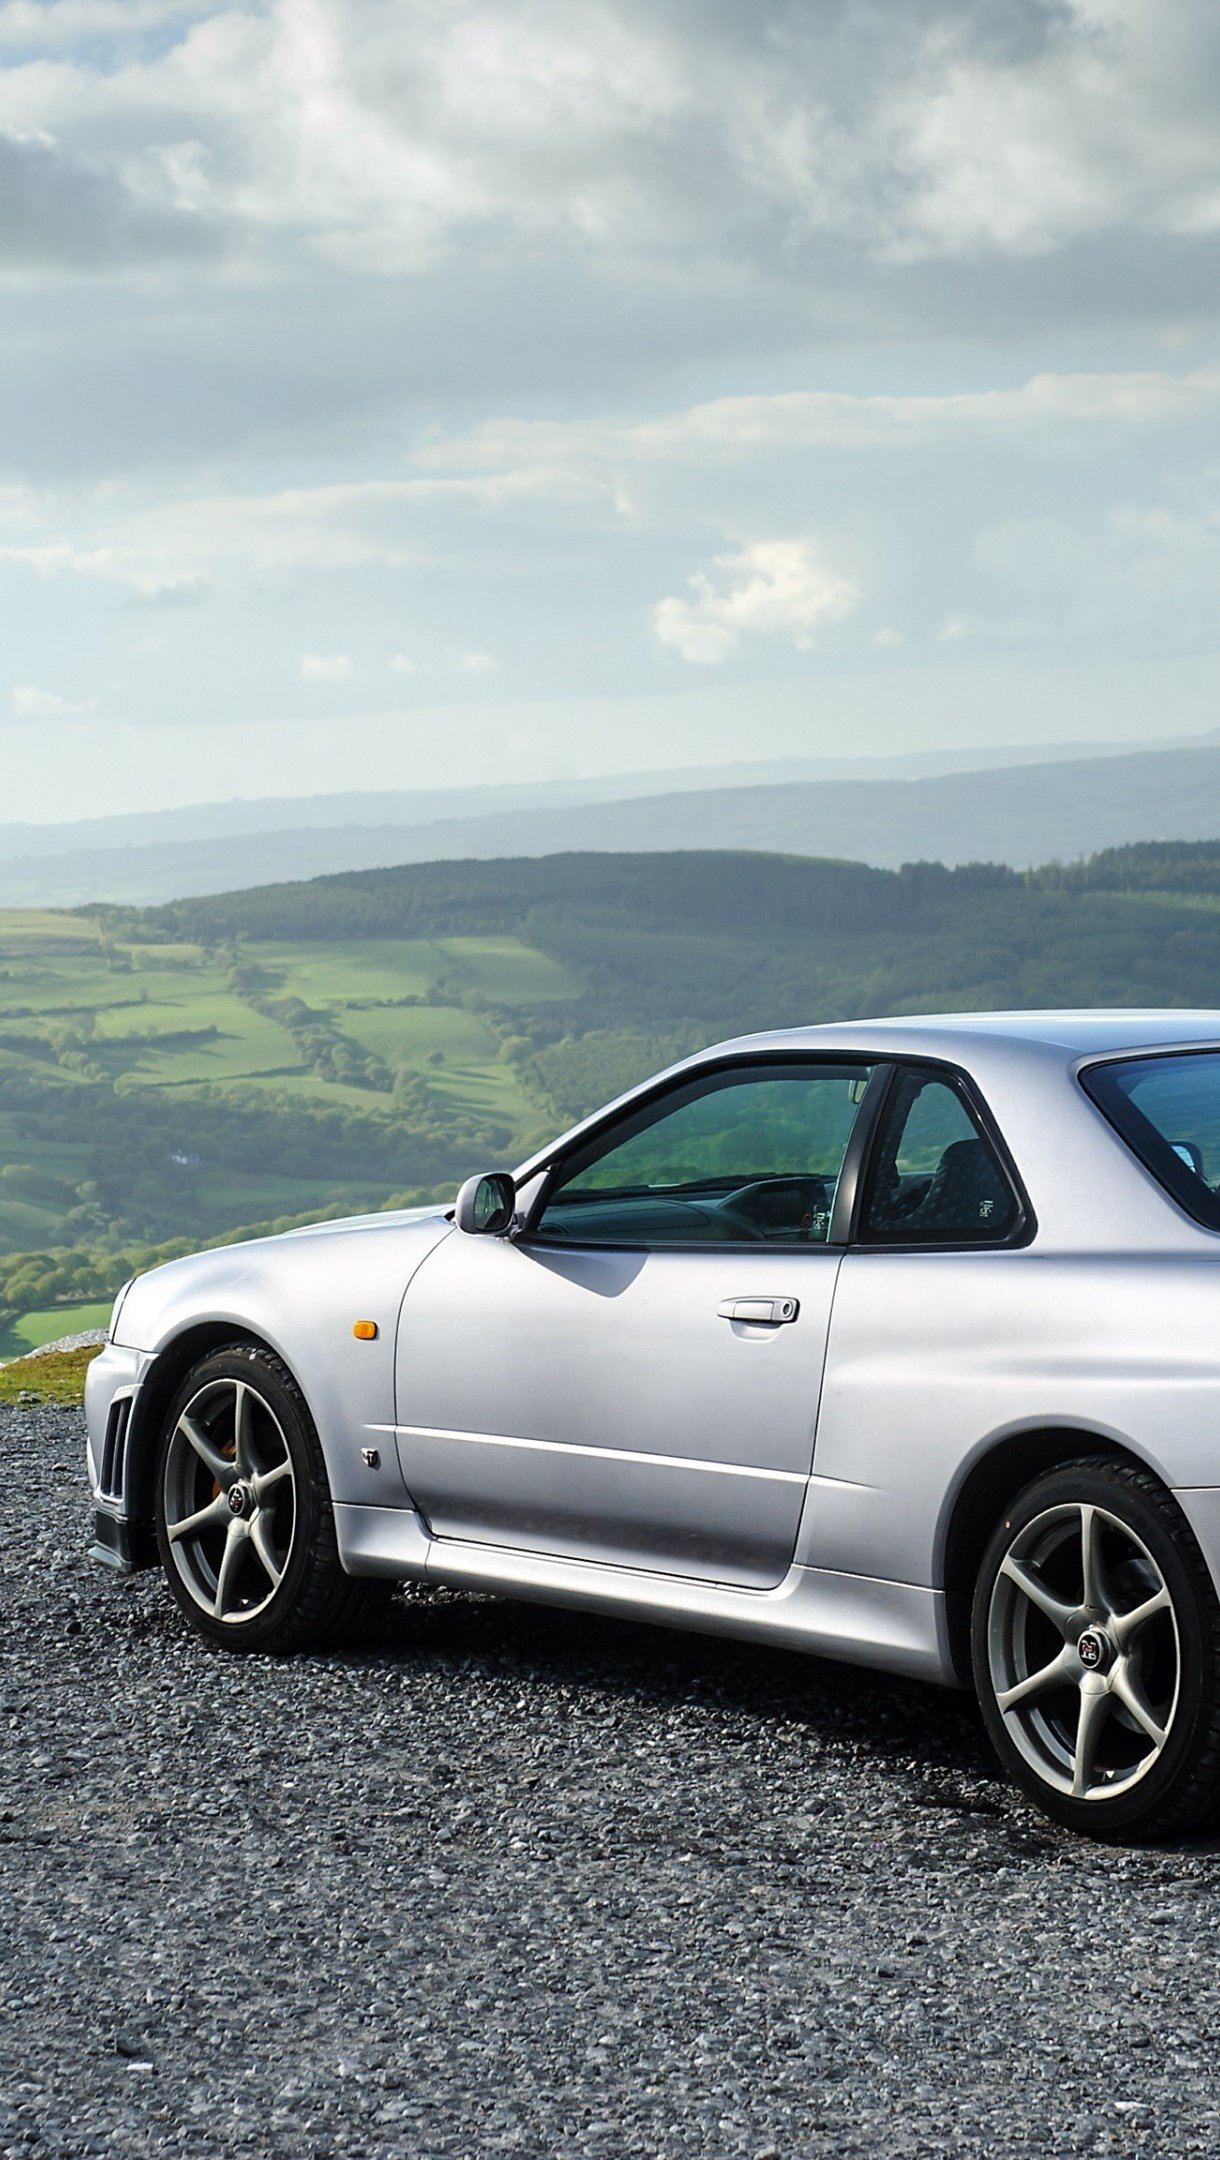 Wallpaper Nissan Skyline GT R gray side Vertical